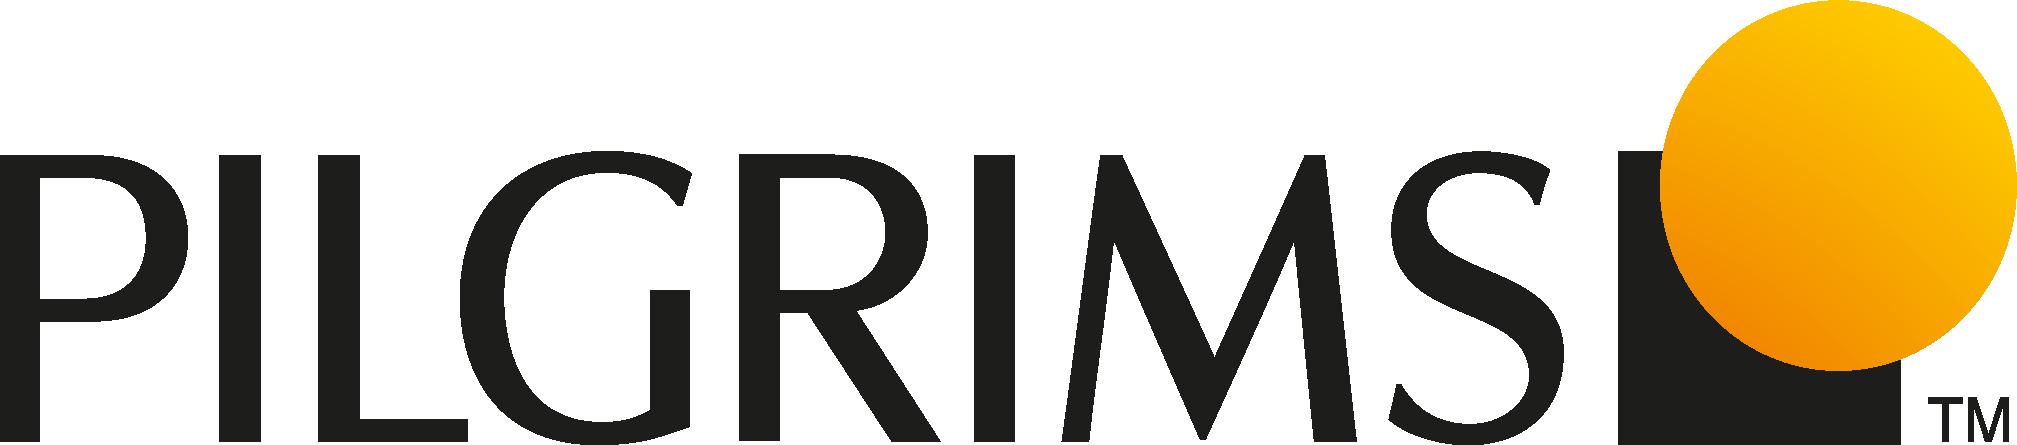 Pilgrims Risk Management Group